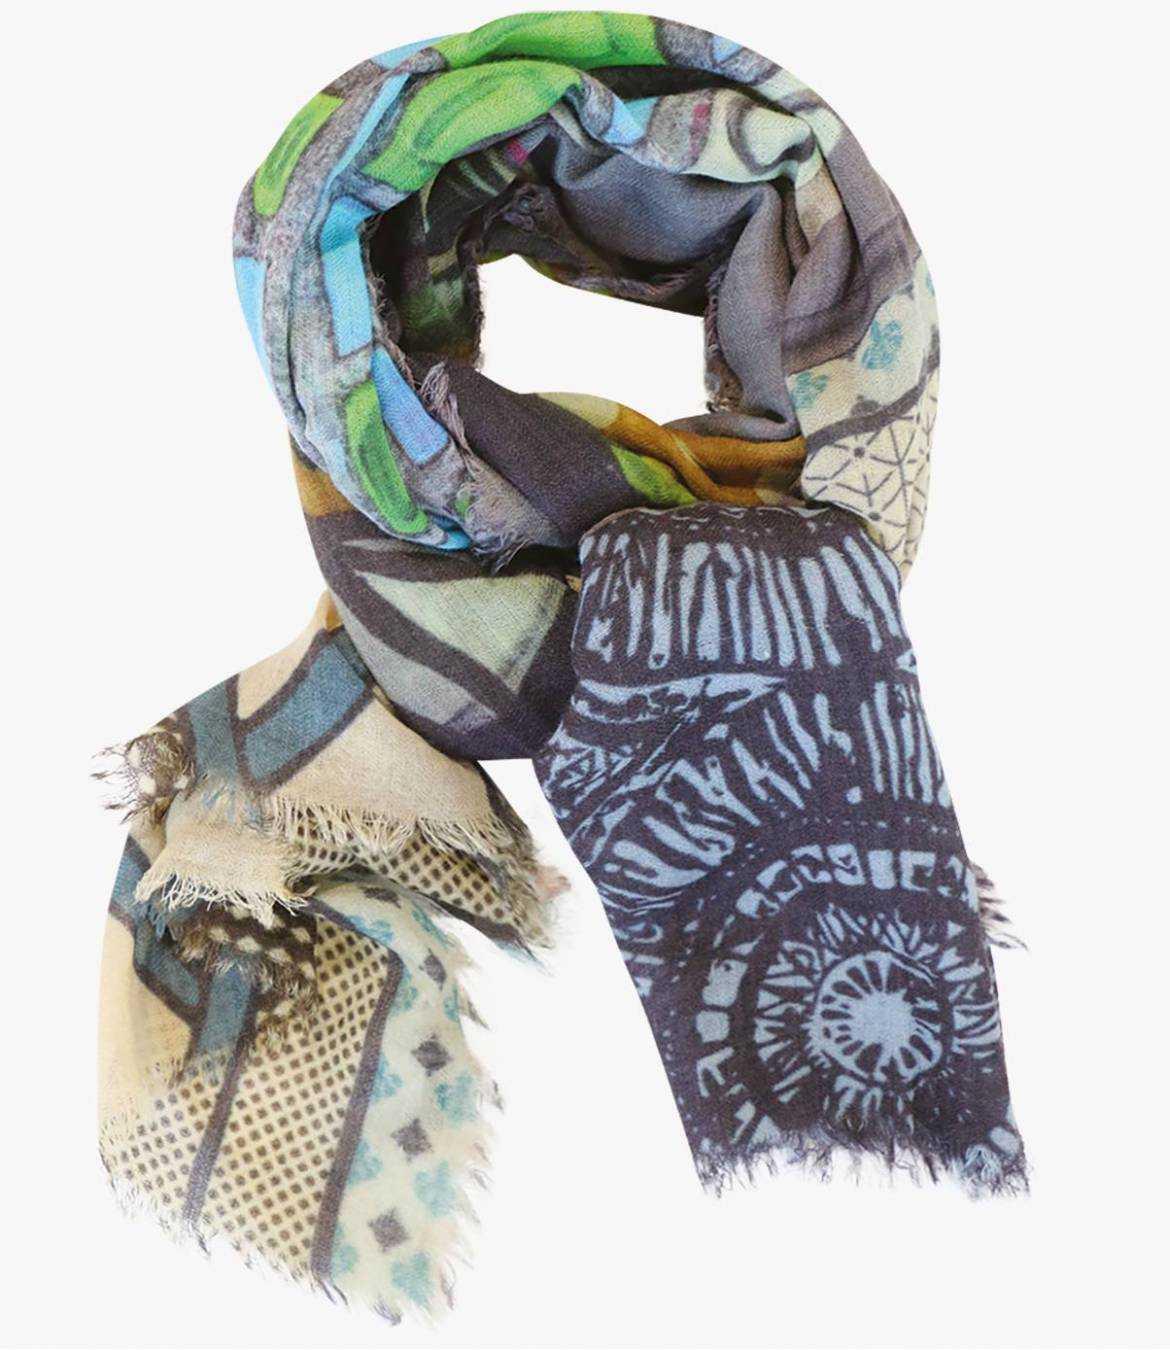 LUCIDE Wool scarf, Nylon for Women 100 x 190 CM Storiatipic - 3